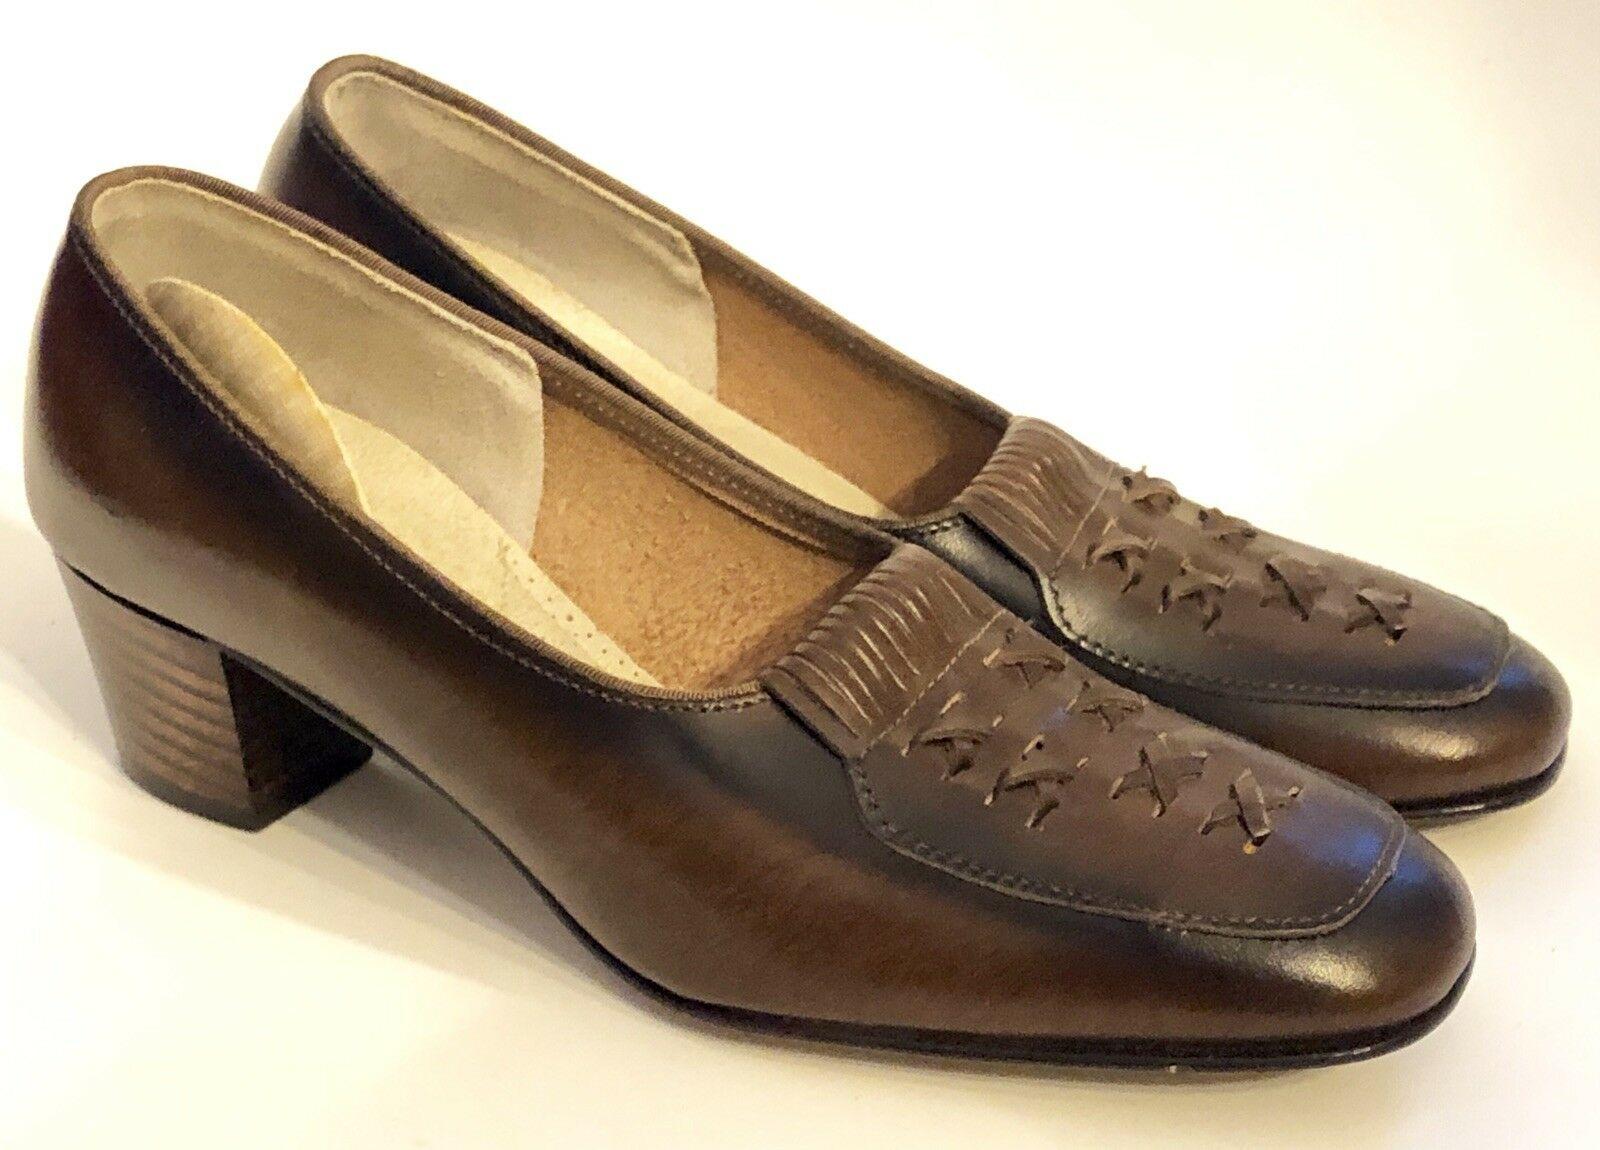 West-Ettes True Vintage 6.5 M Dark Brown Leather Heels Mid Century Ombre Classic